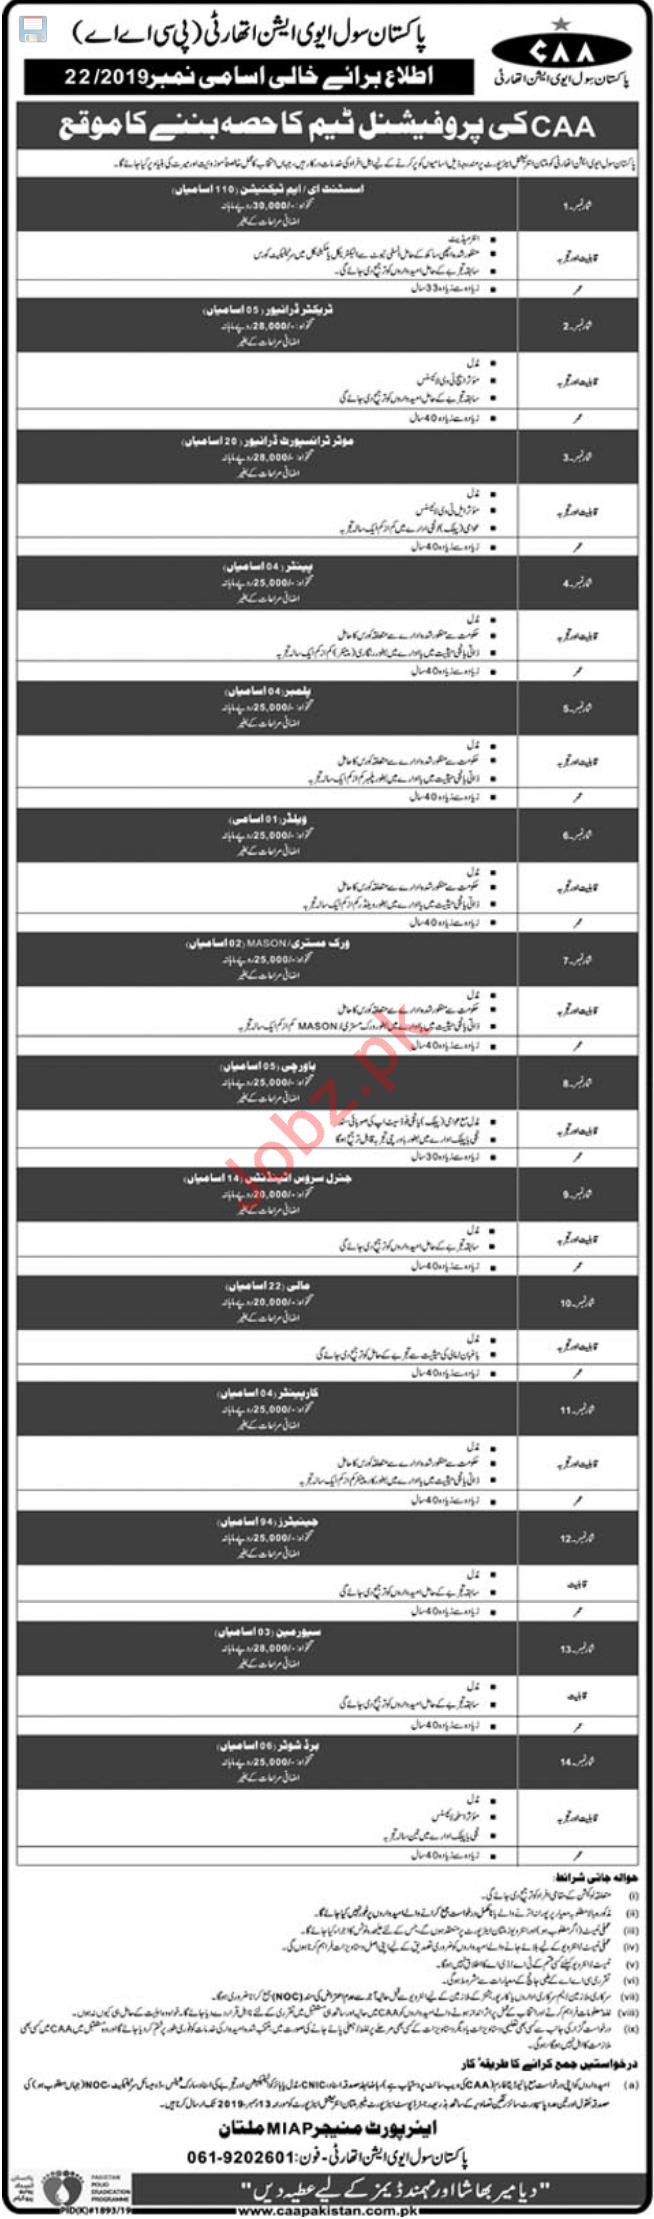 Multan International Airport Pakistan MIAP Jobs 2019